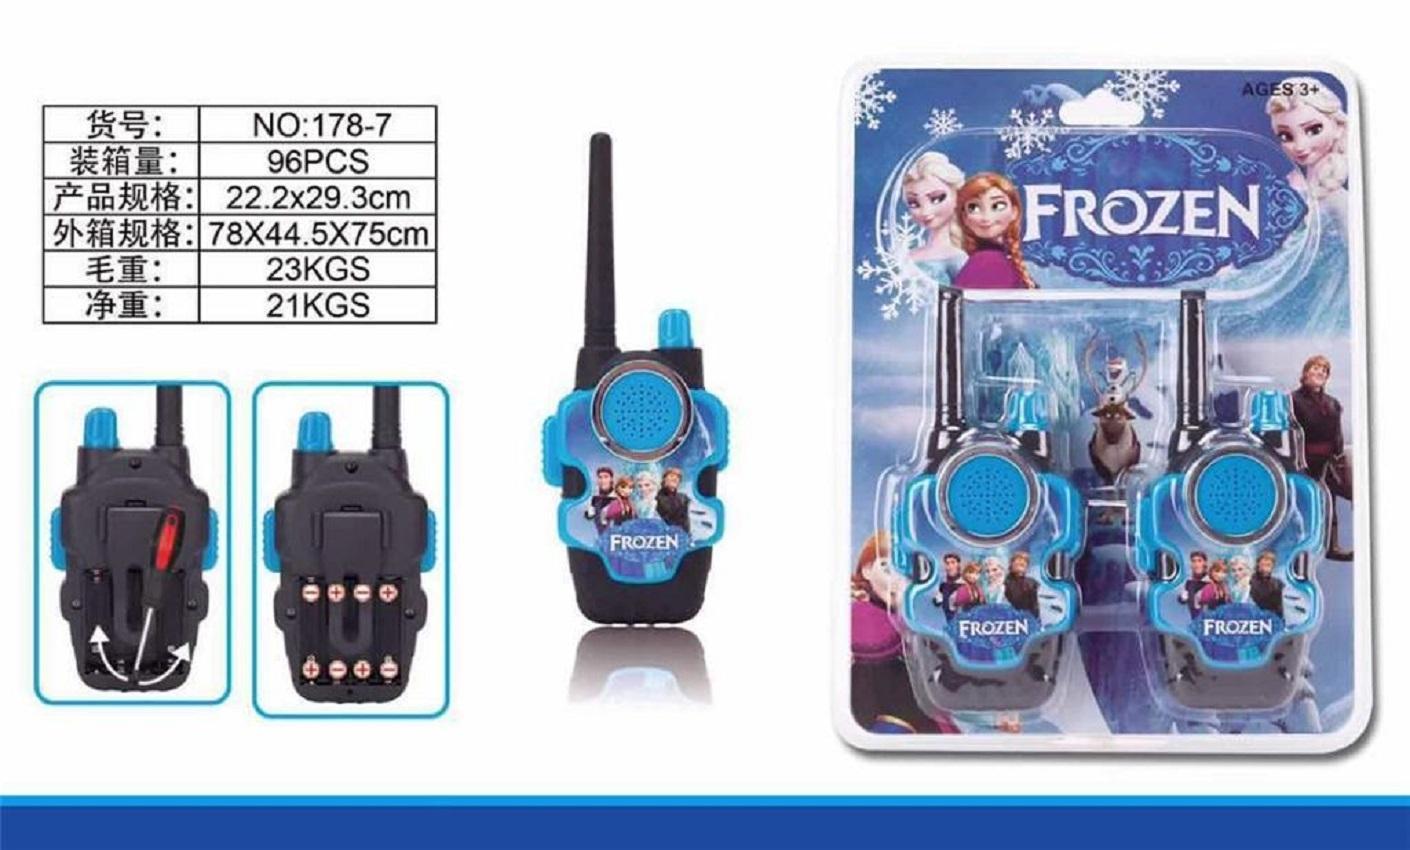 Ariatp Linkfabnlittleslever Buy Linkfabnlittles Tp Link Cpe610 5ghz 300mbps Outdoor Cpe Frozen Walkie Talkie Set